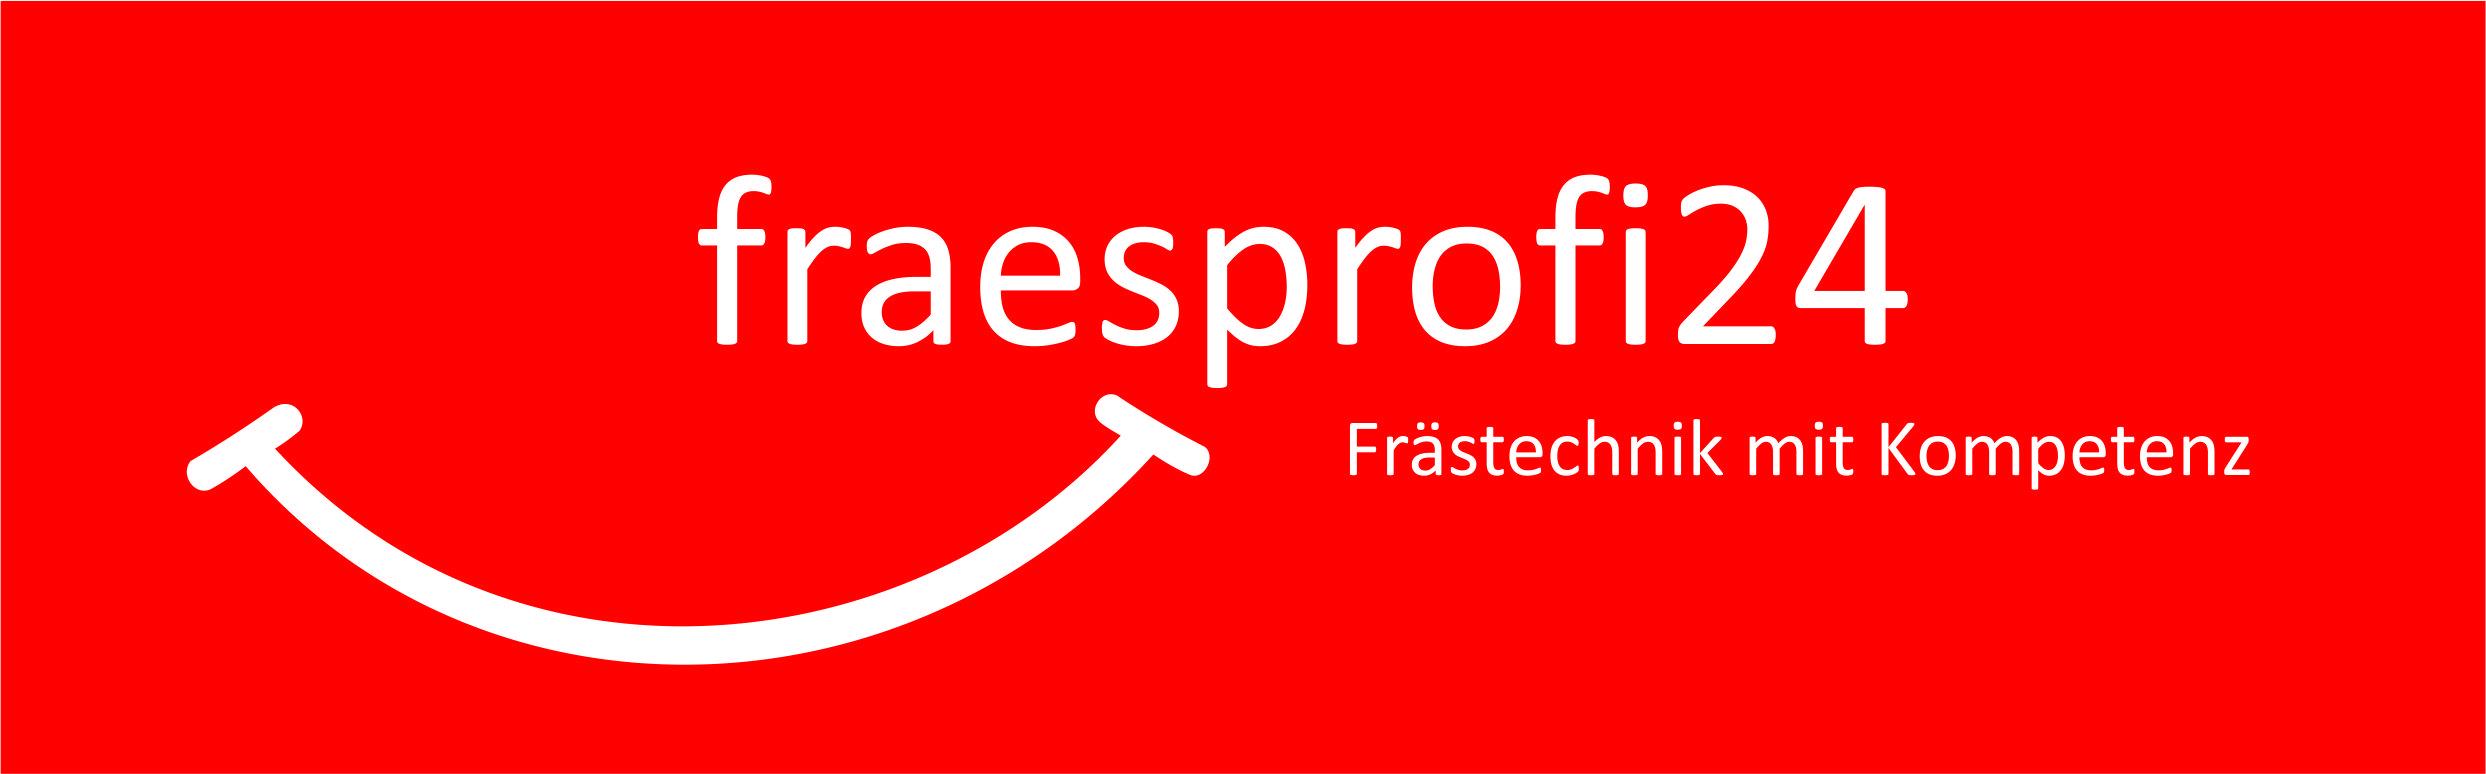 Fraesprofi24